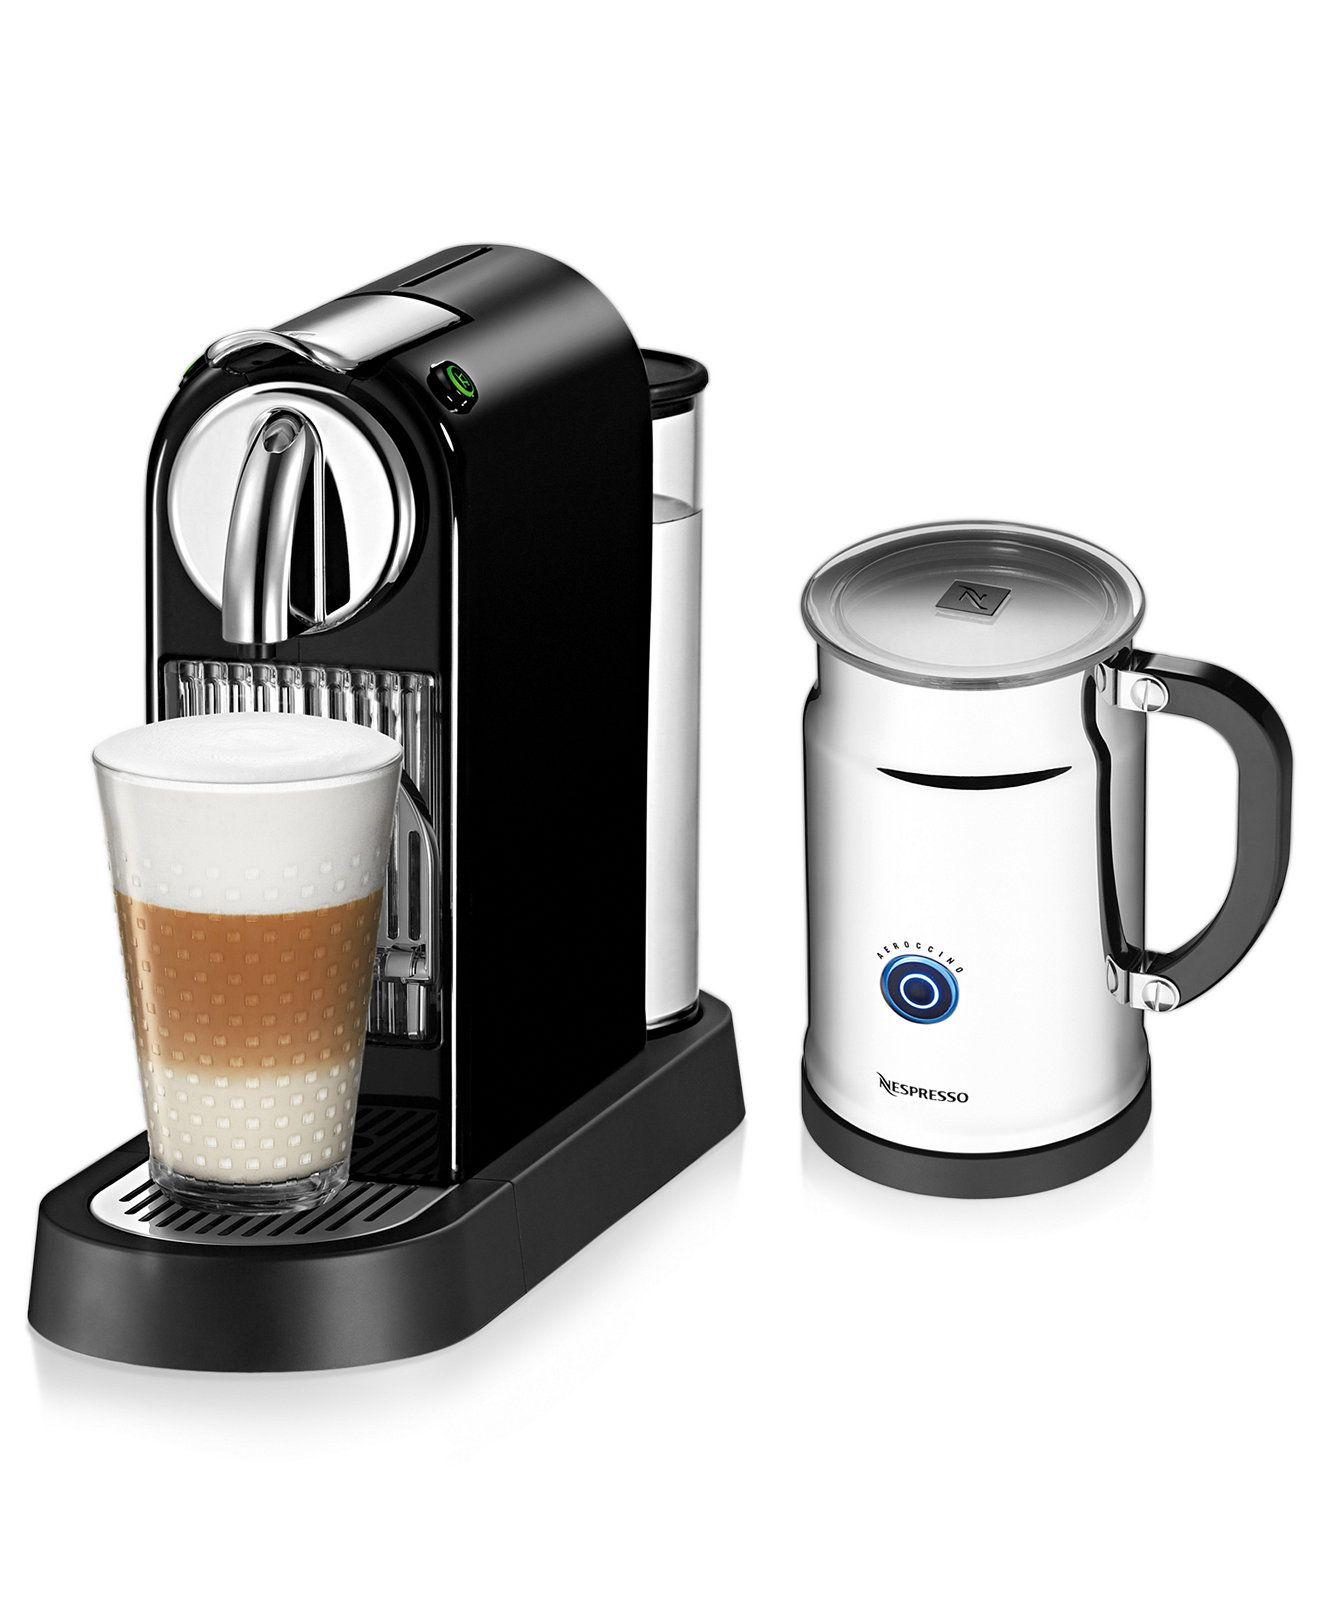 Nespresso c111d111 espresso maker citiz bundle coffee